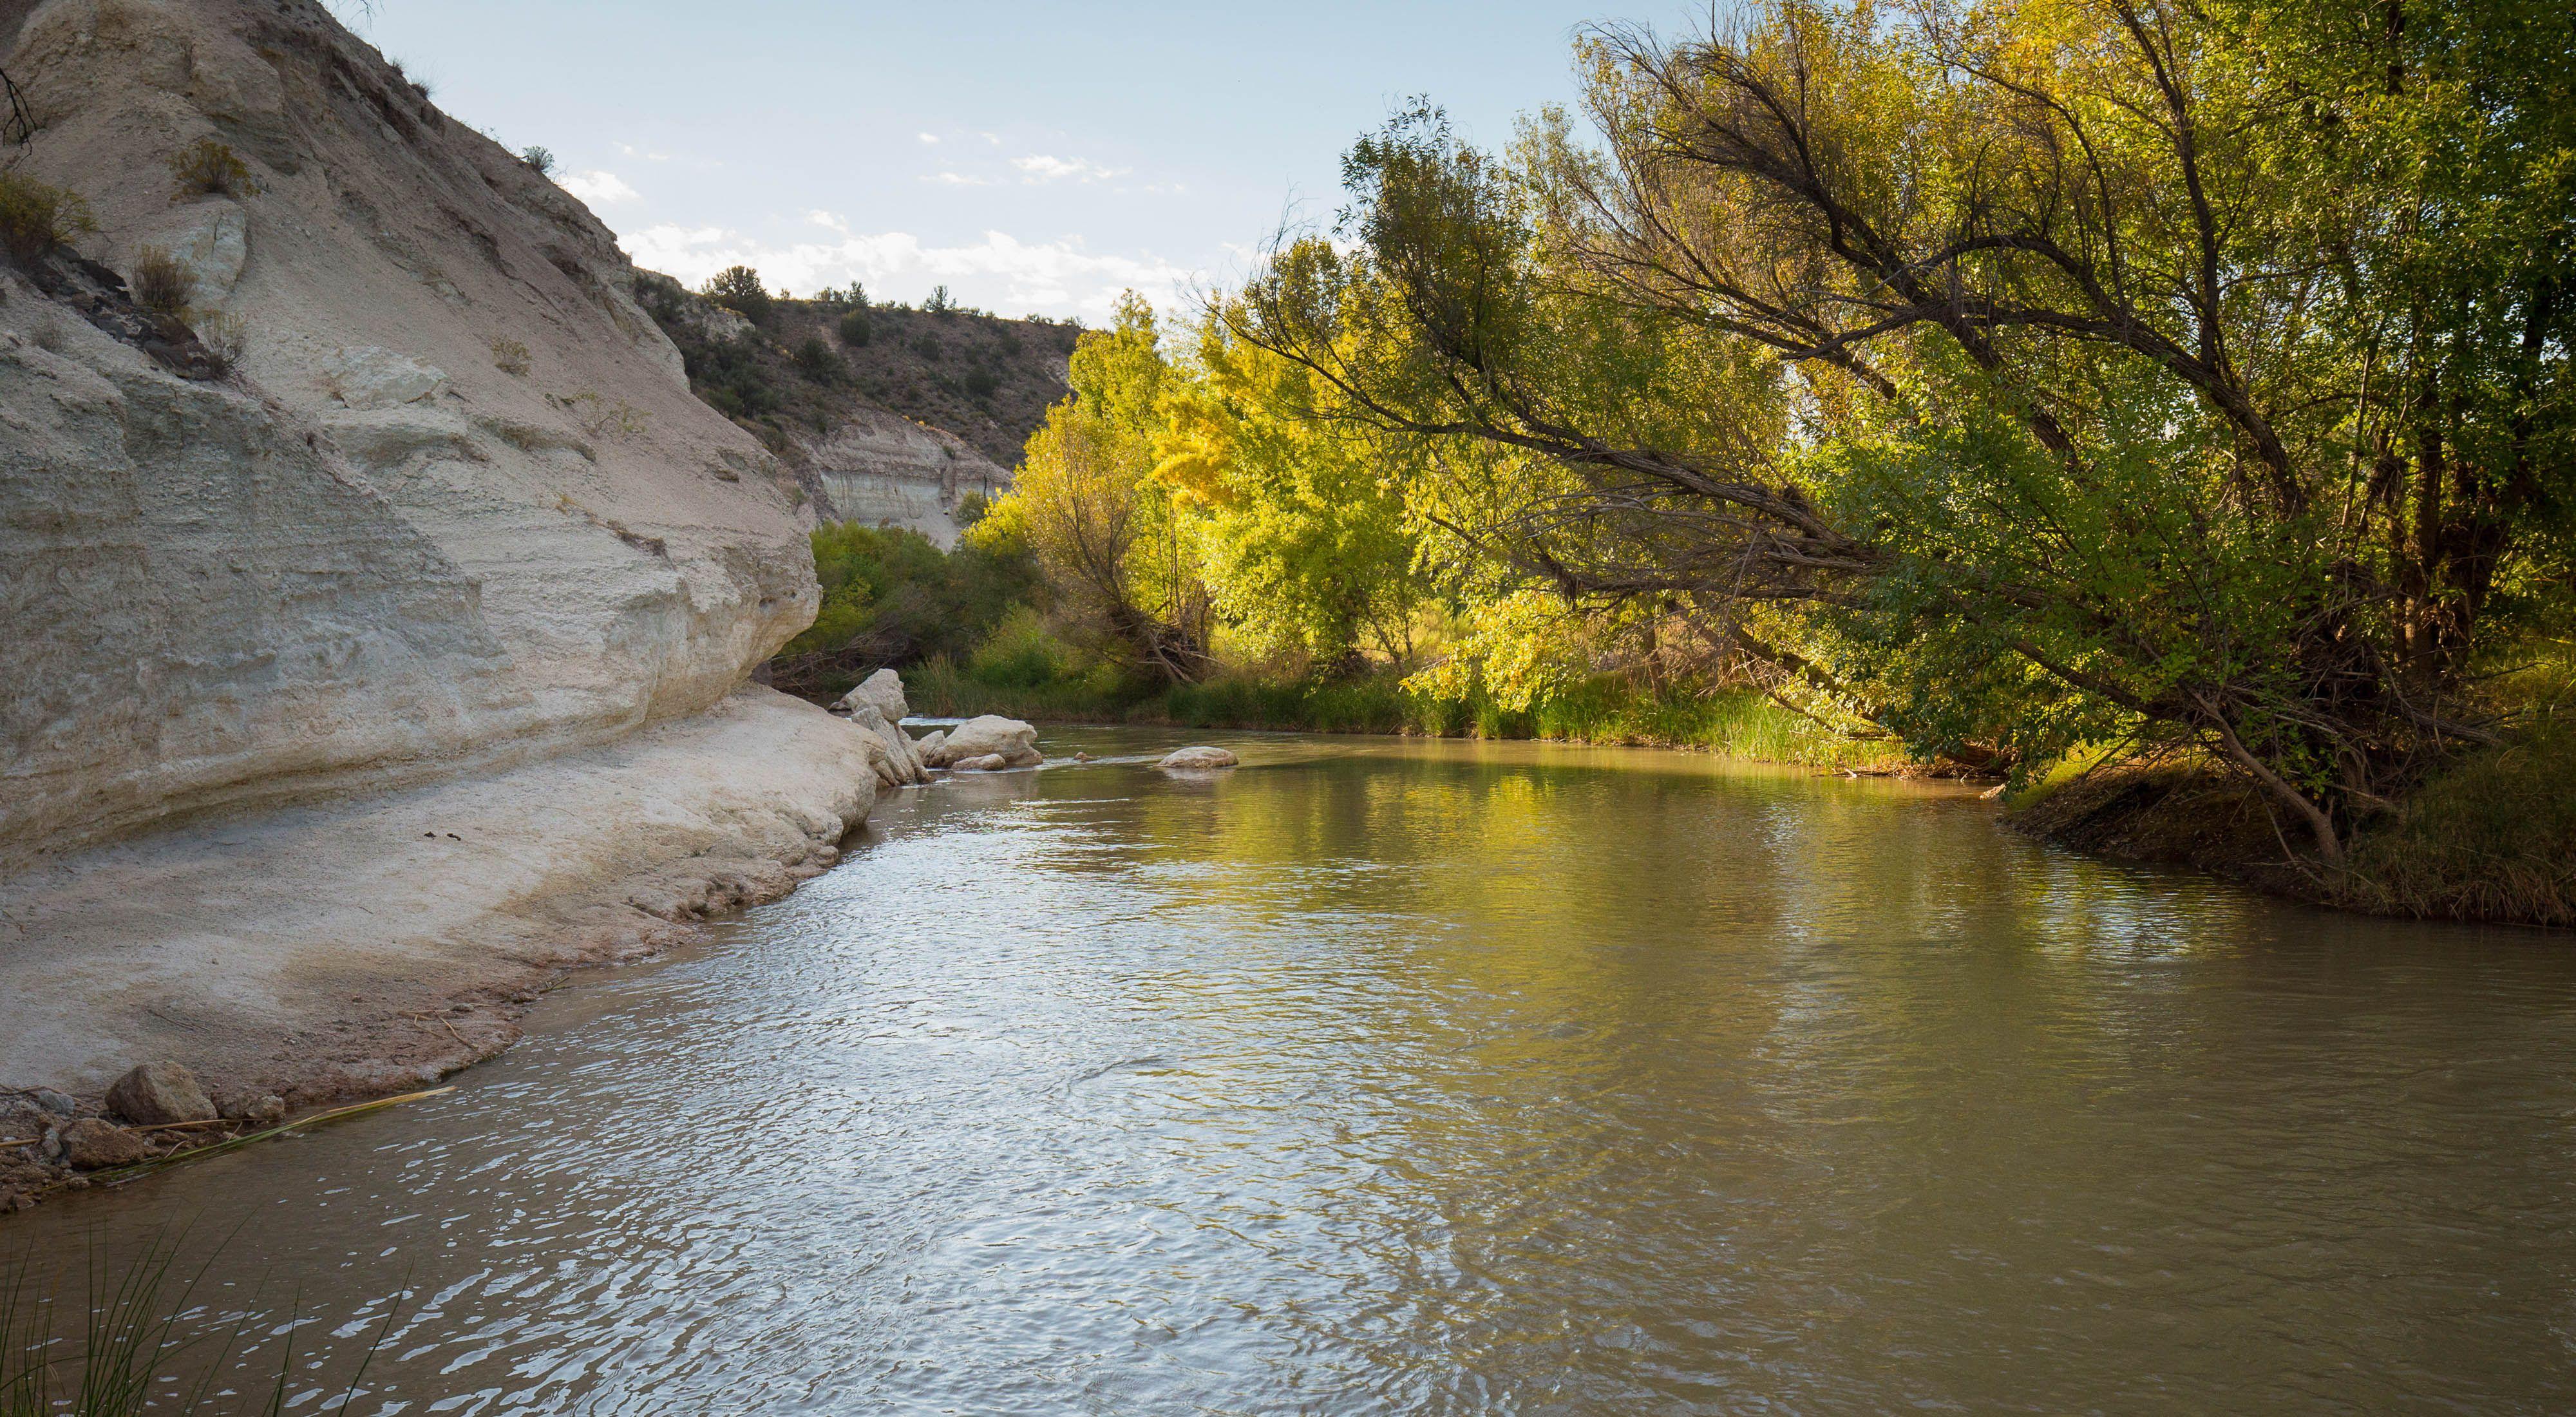 The Verde river near Camp Verde, Arizona.